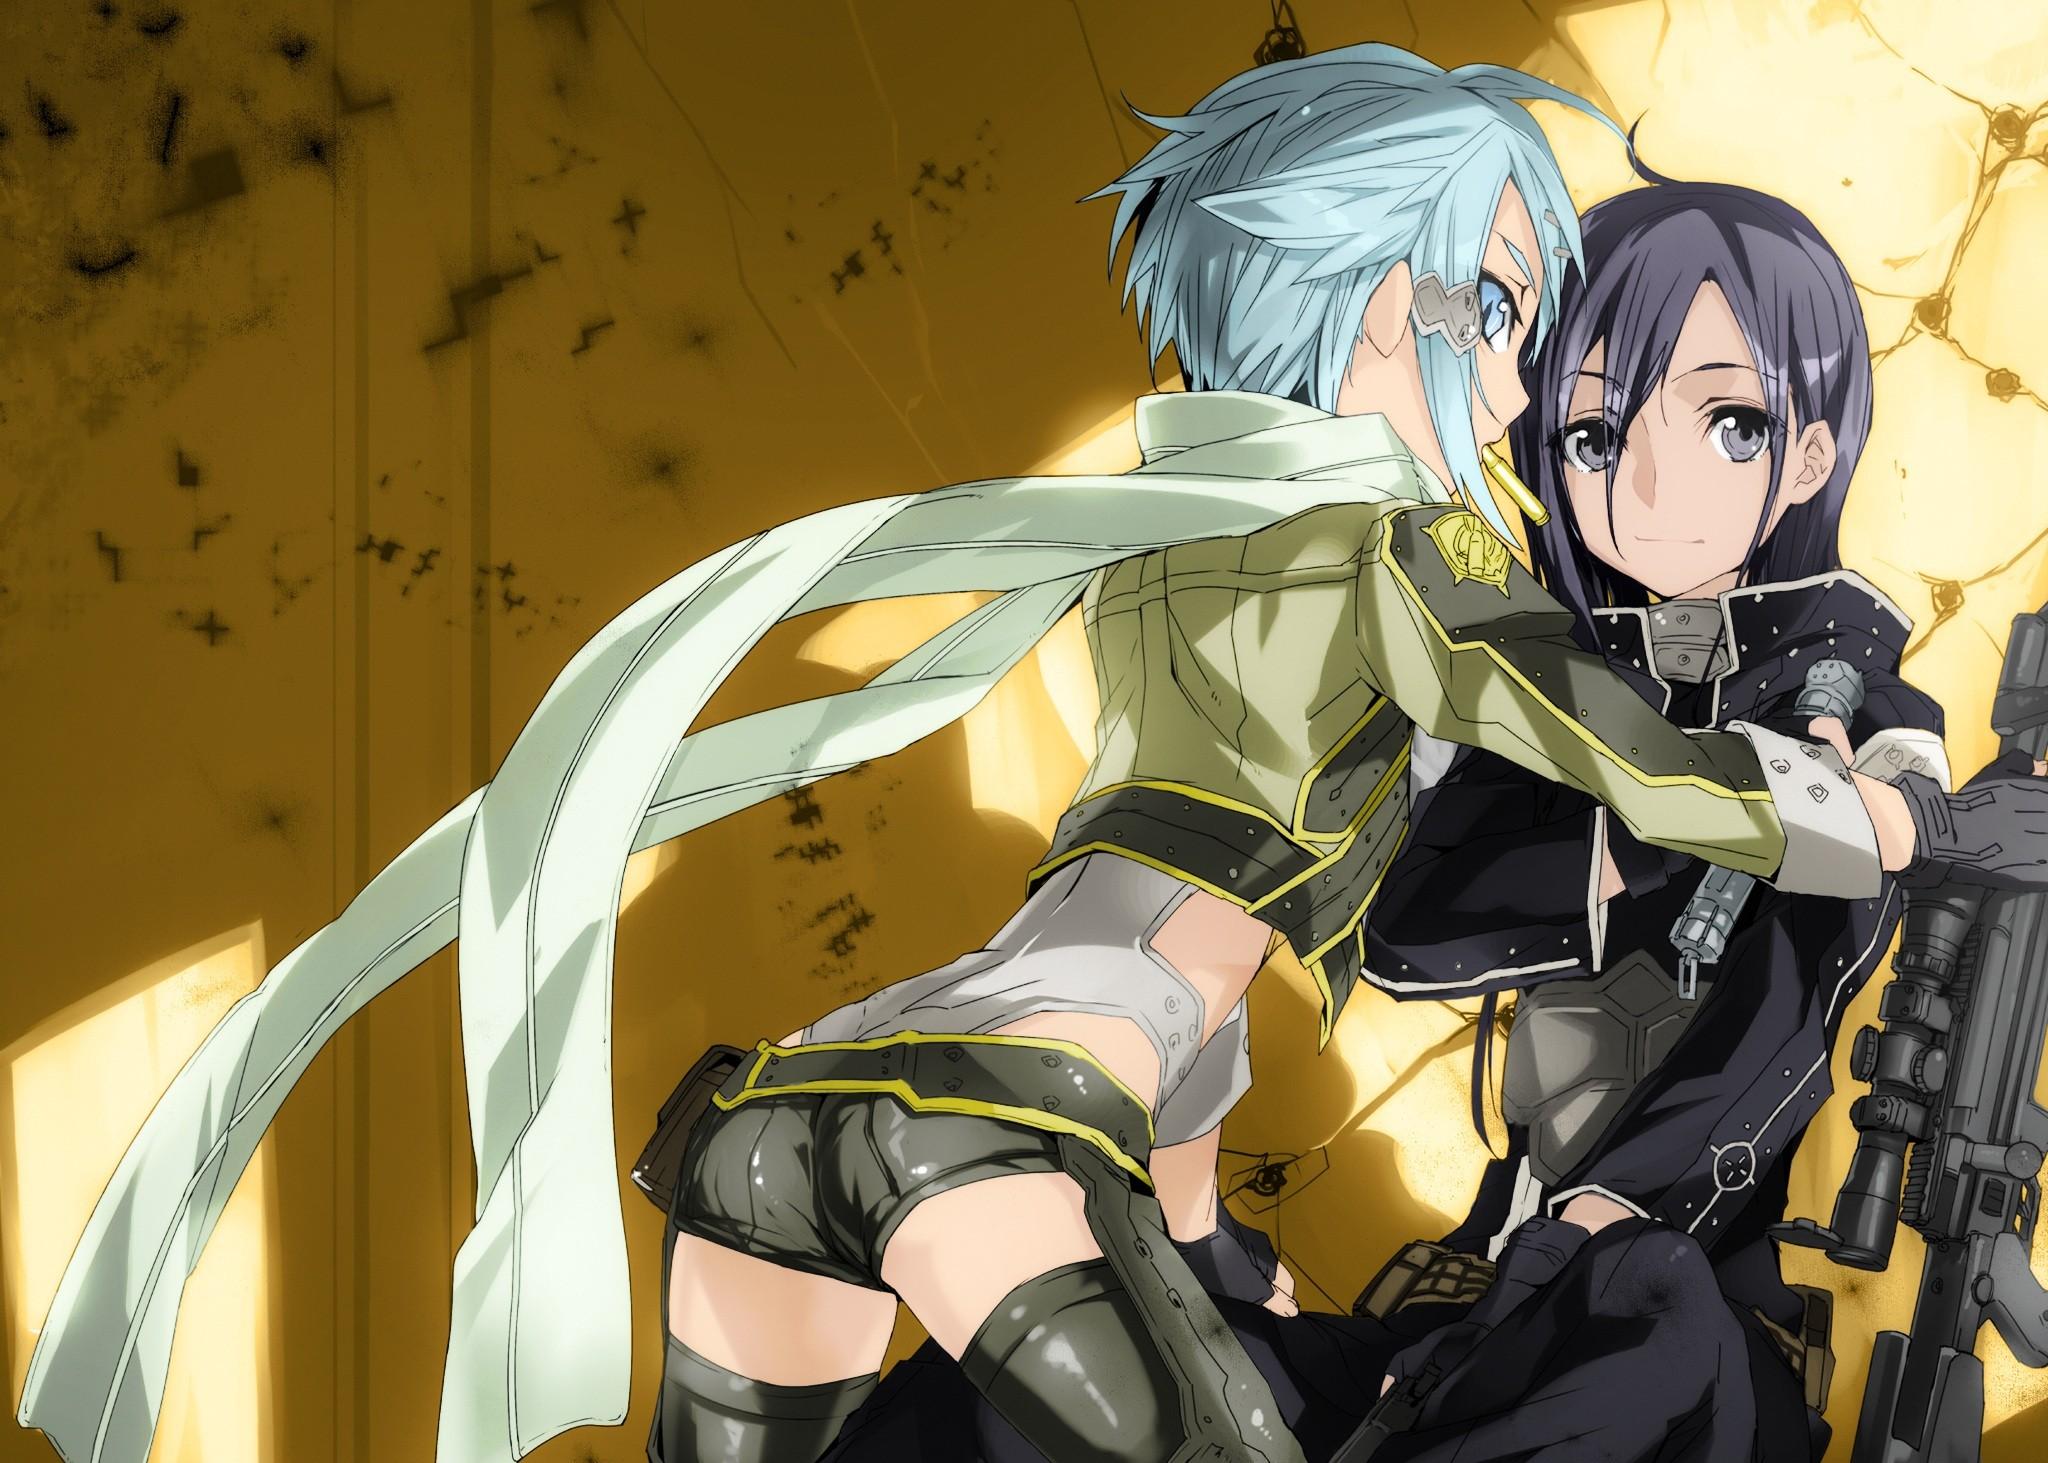 Anime 2048x1463 anime anime girls Sword Art Online Kirigaya Kazuto Asada Shino